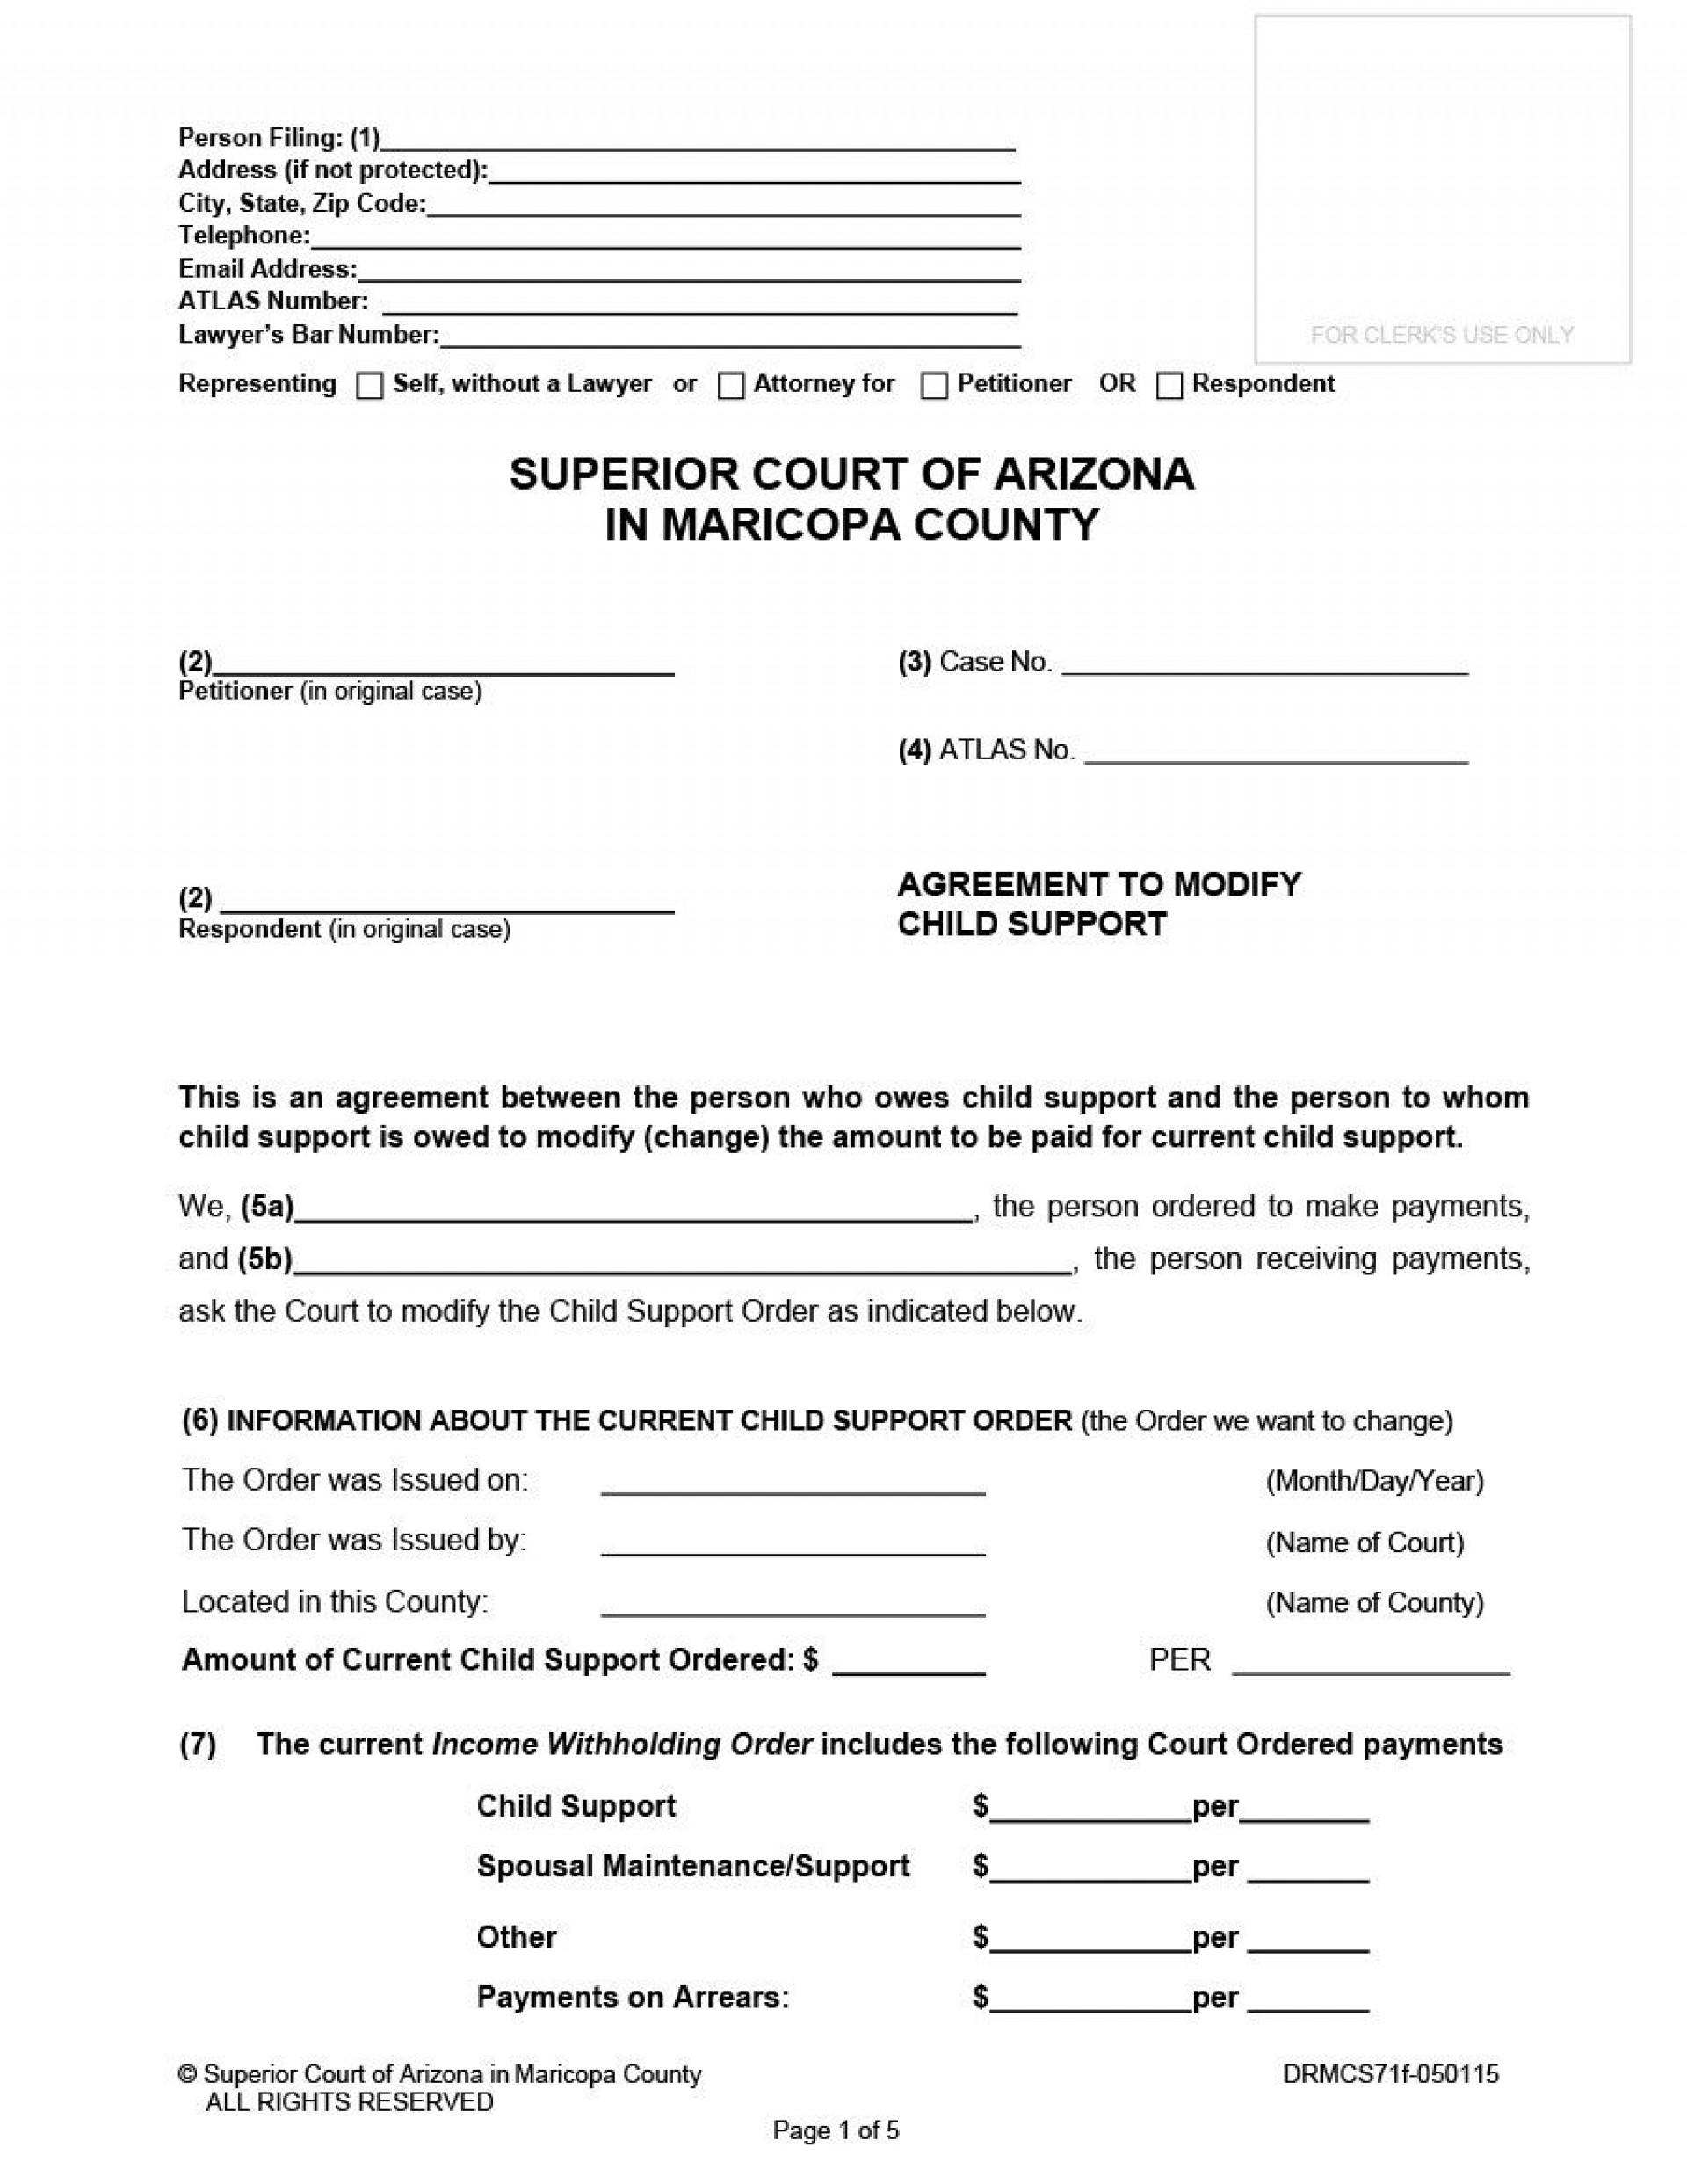 005 Fascinating Child Support Agreement Template Sample  Australia Bc Alberta1920